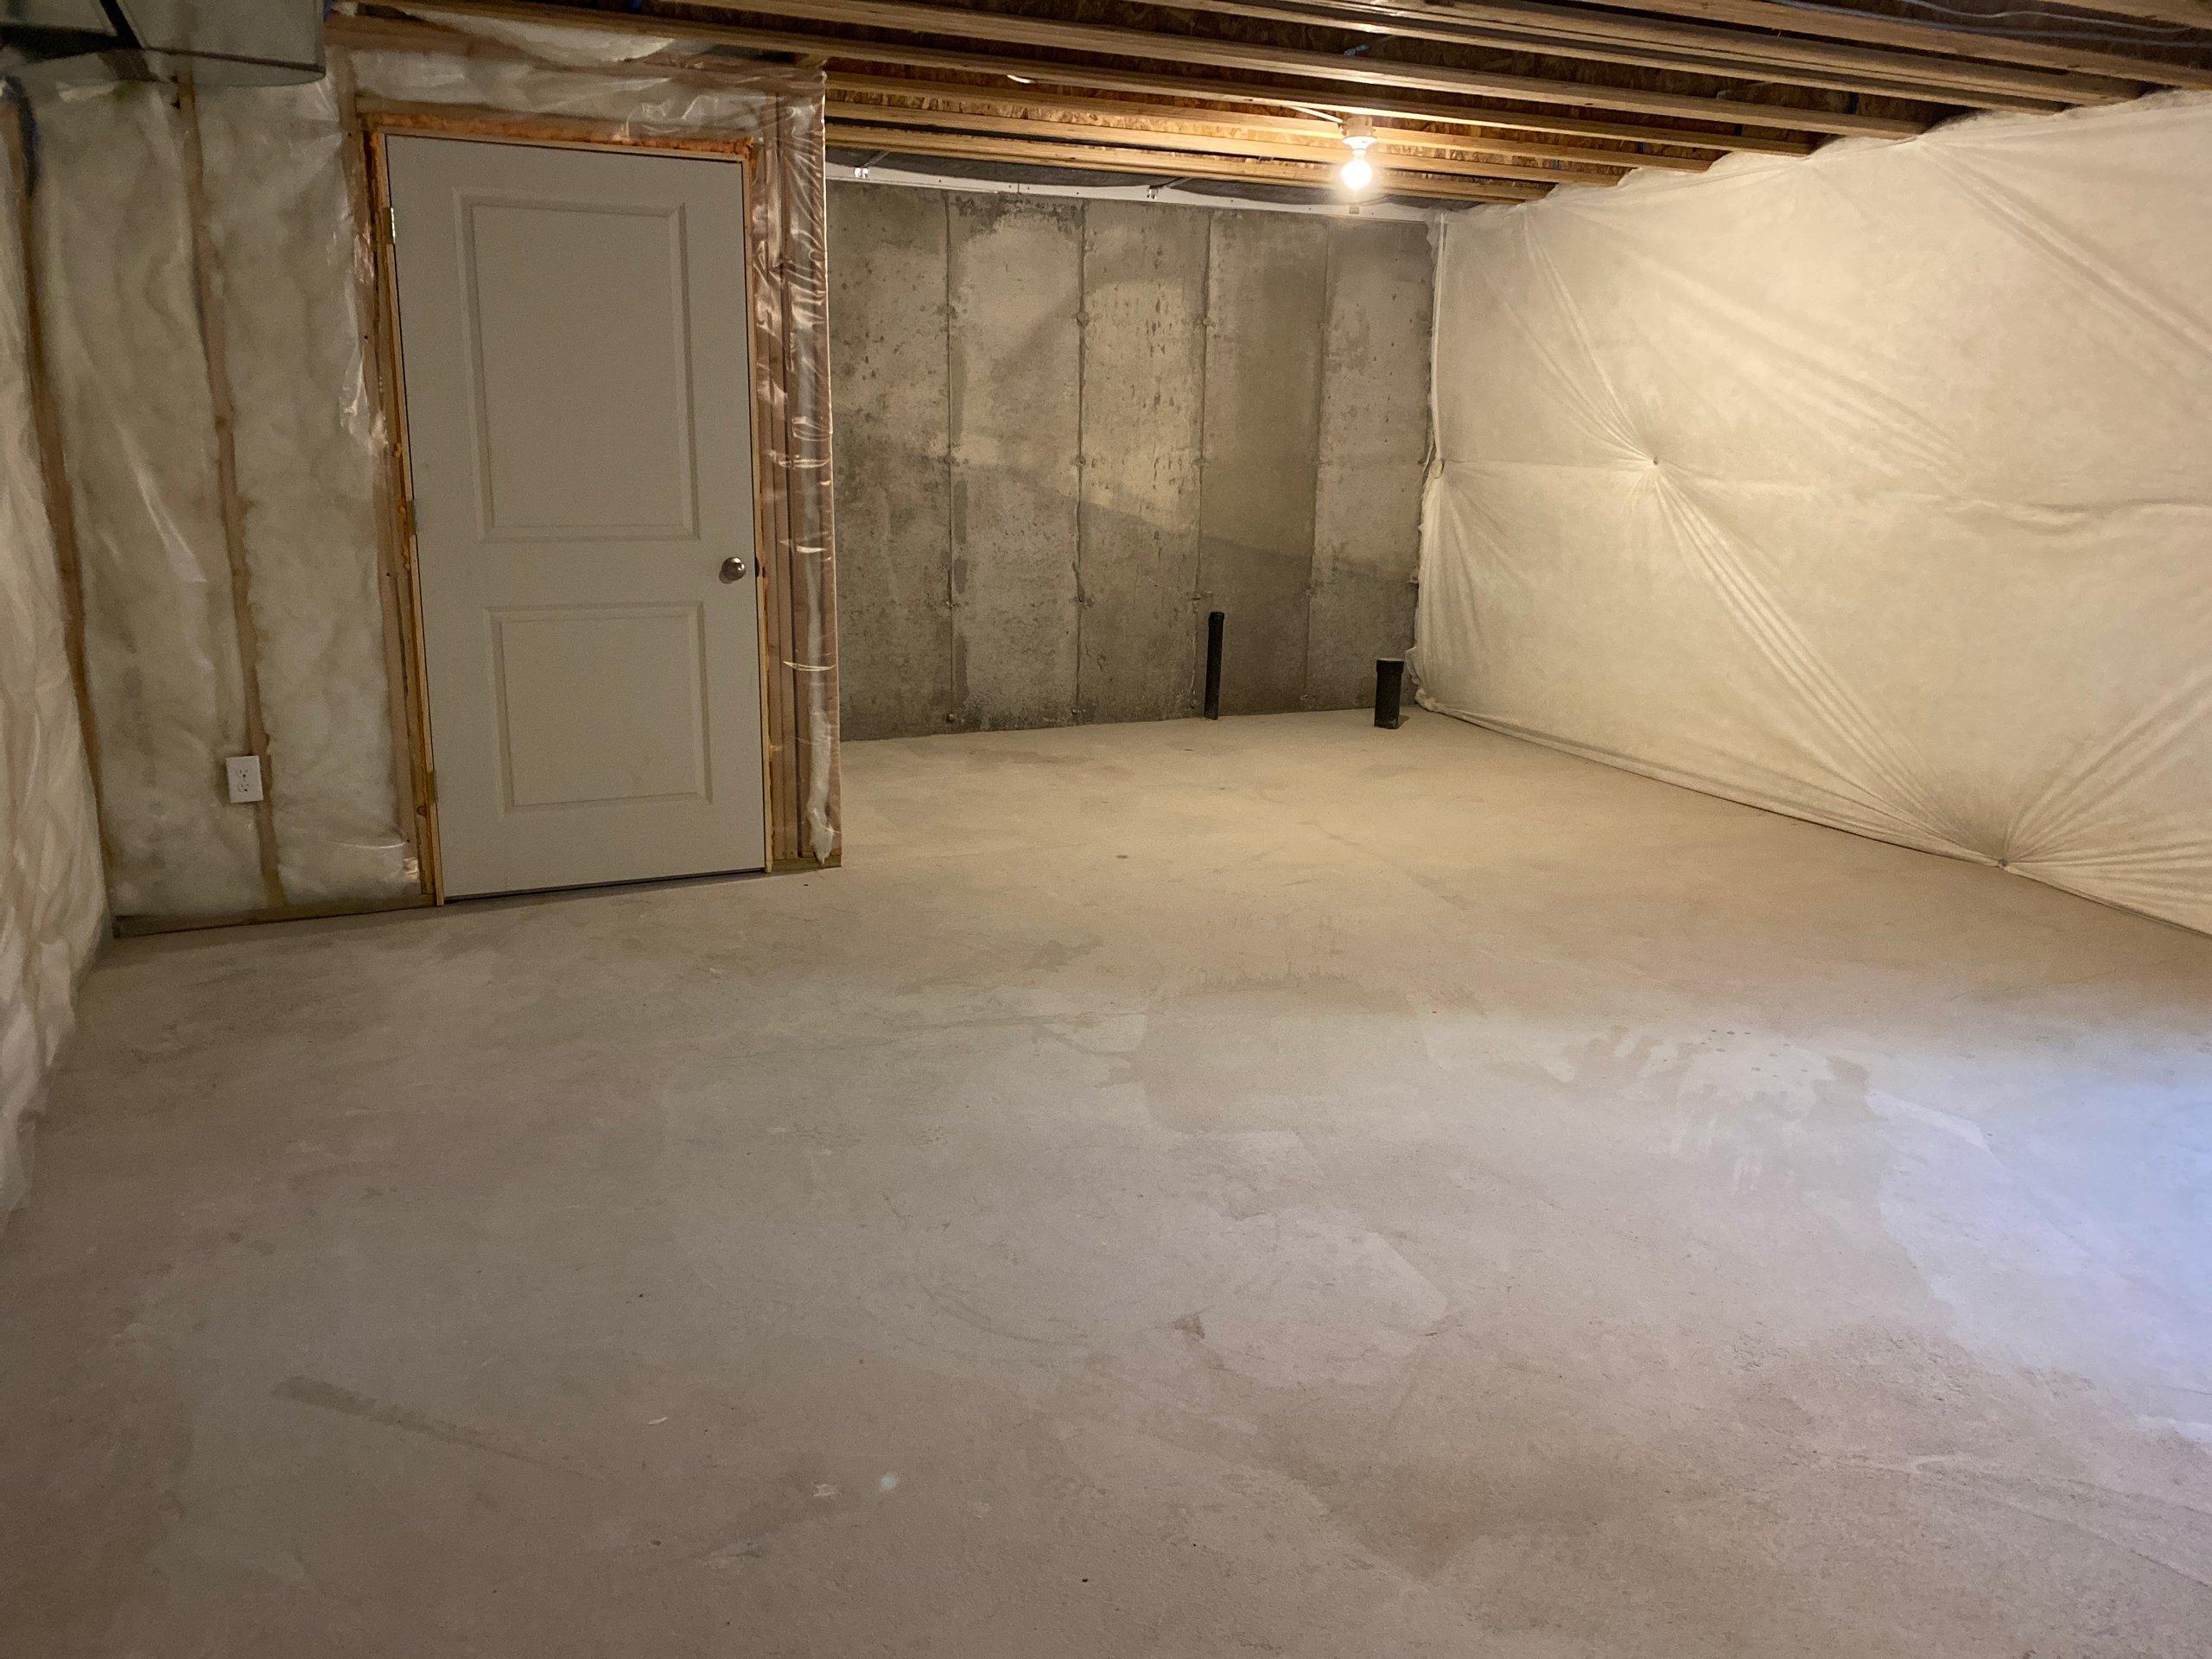 16x15 Basement self storage unit